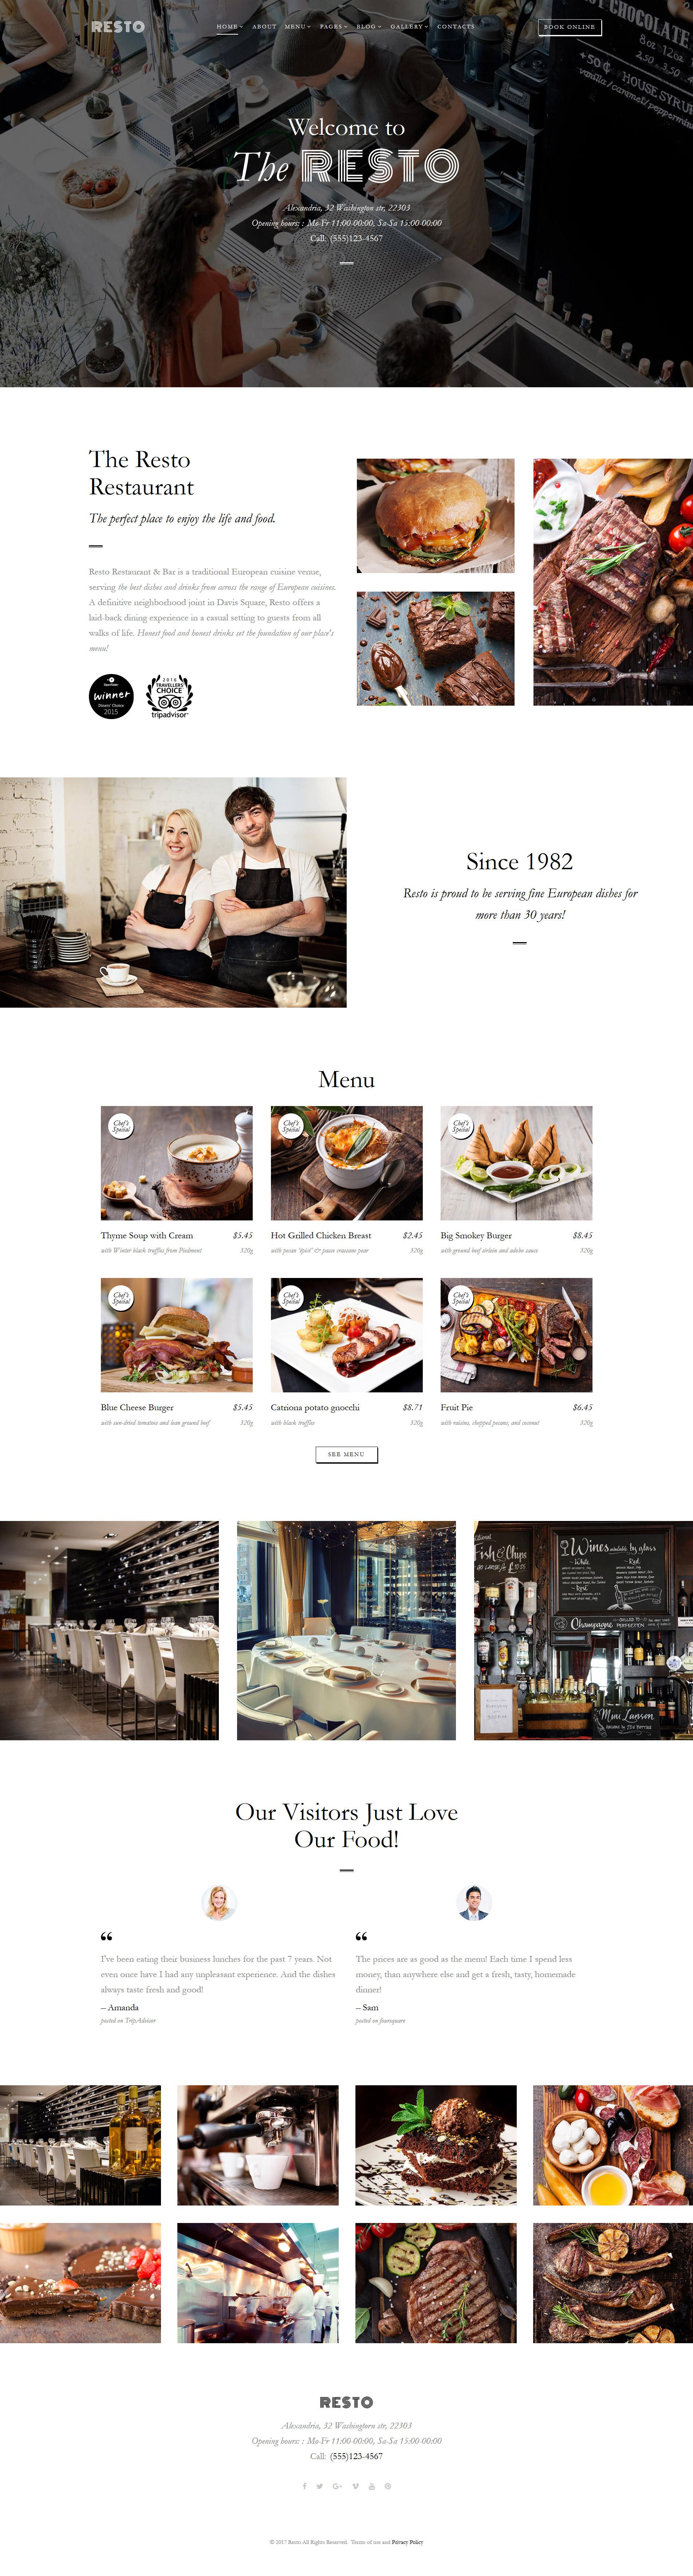 """Resto - Cafe & Restaurant Multipage"" 响应式网页模板 #62276 - 截图"